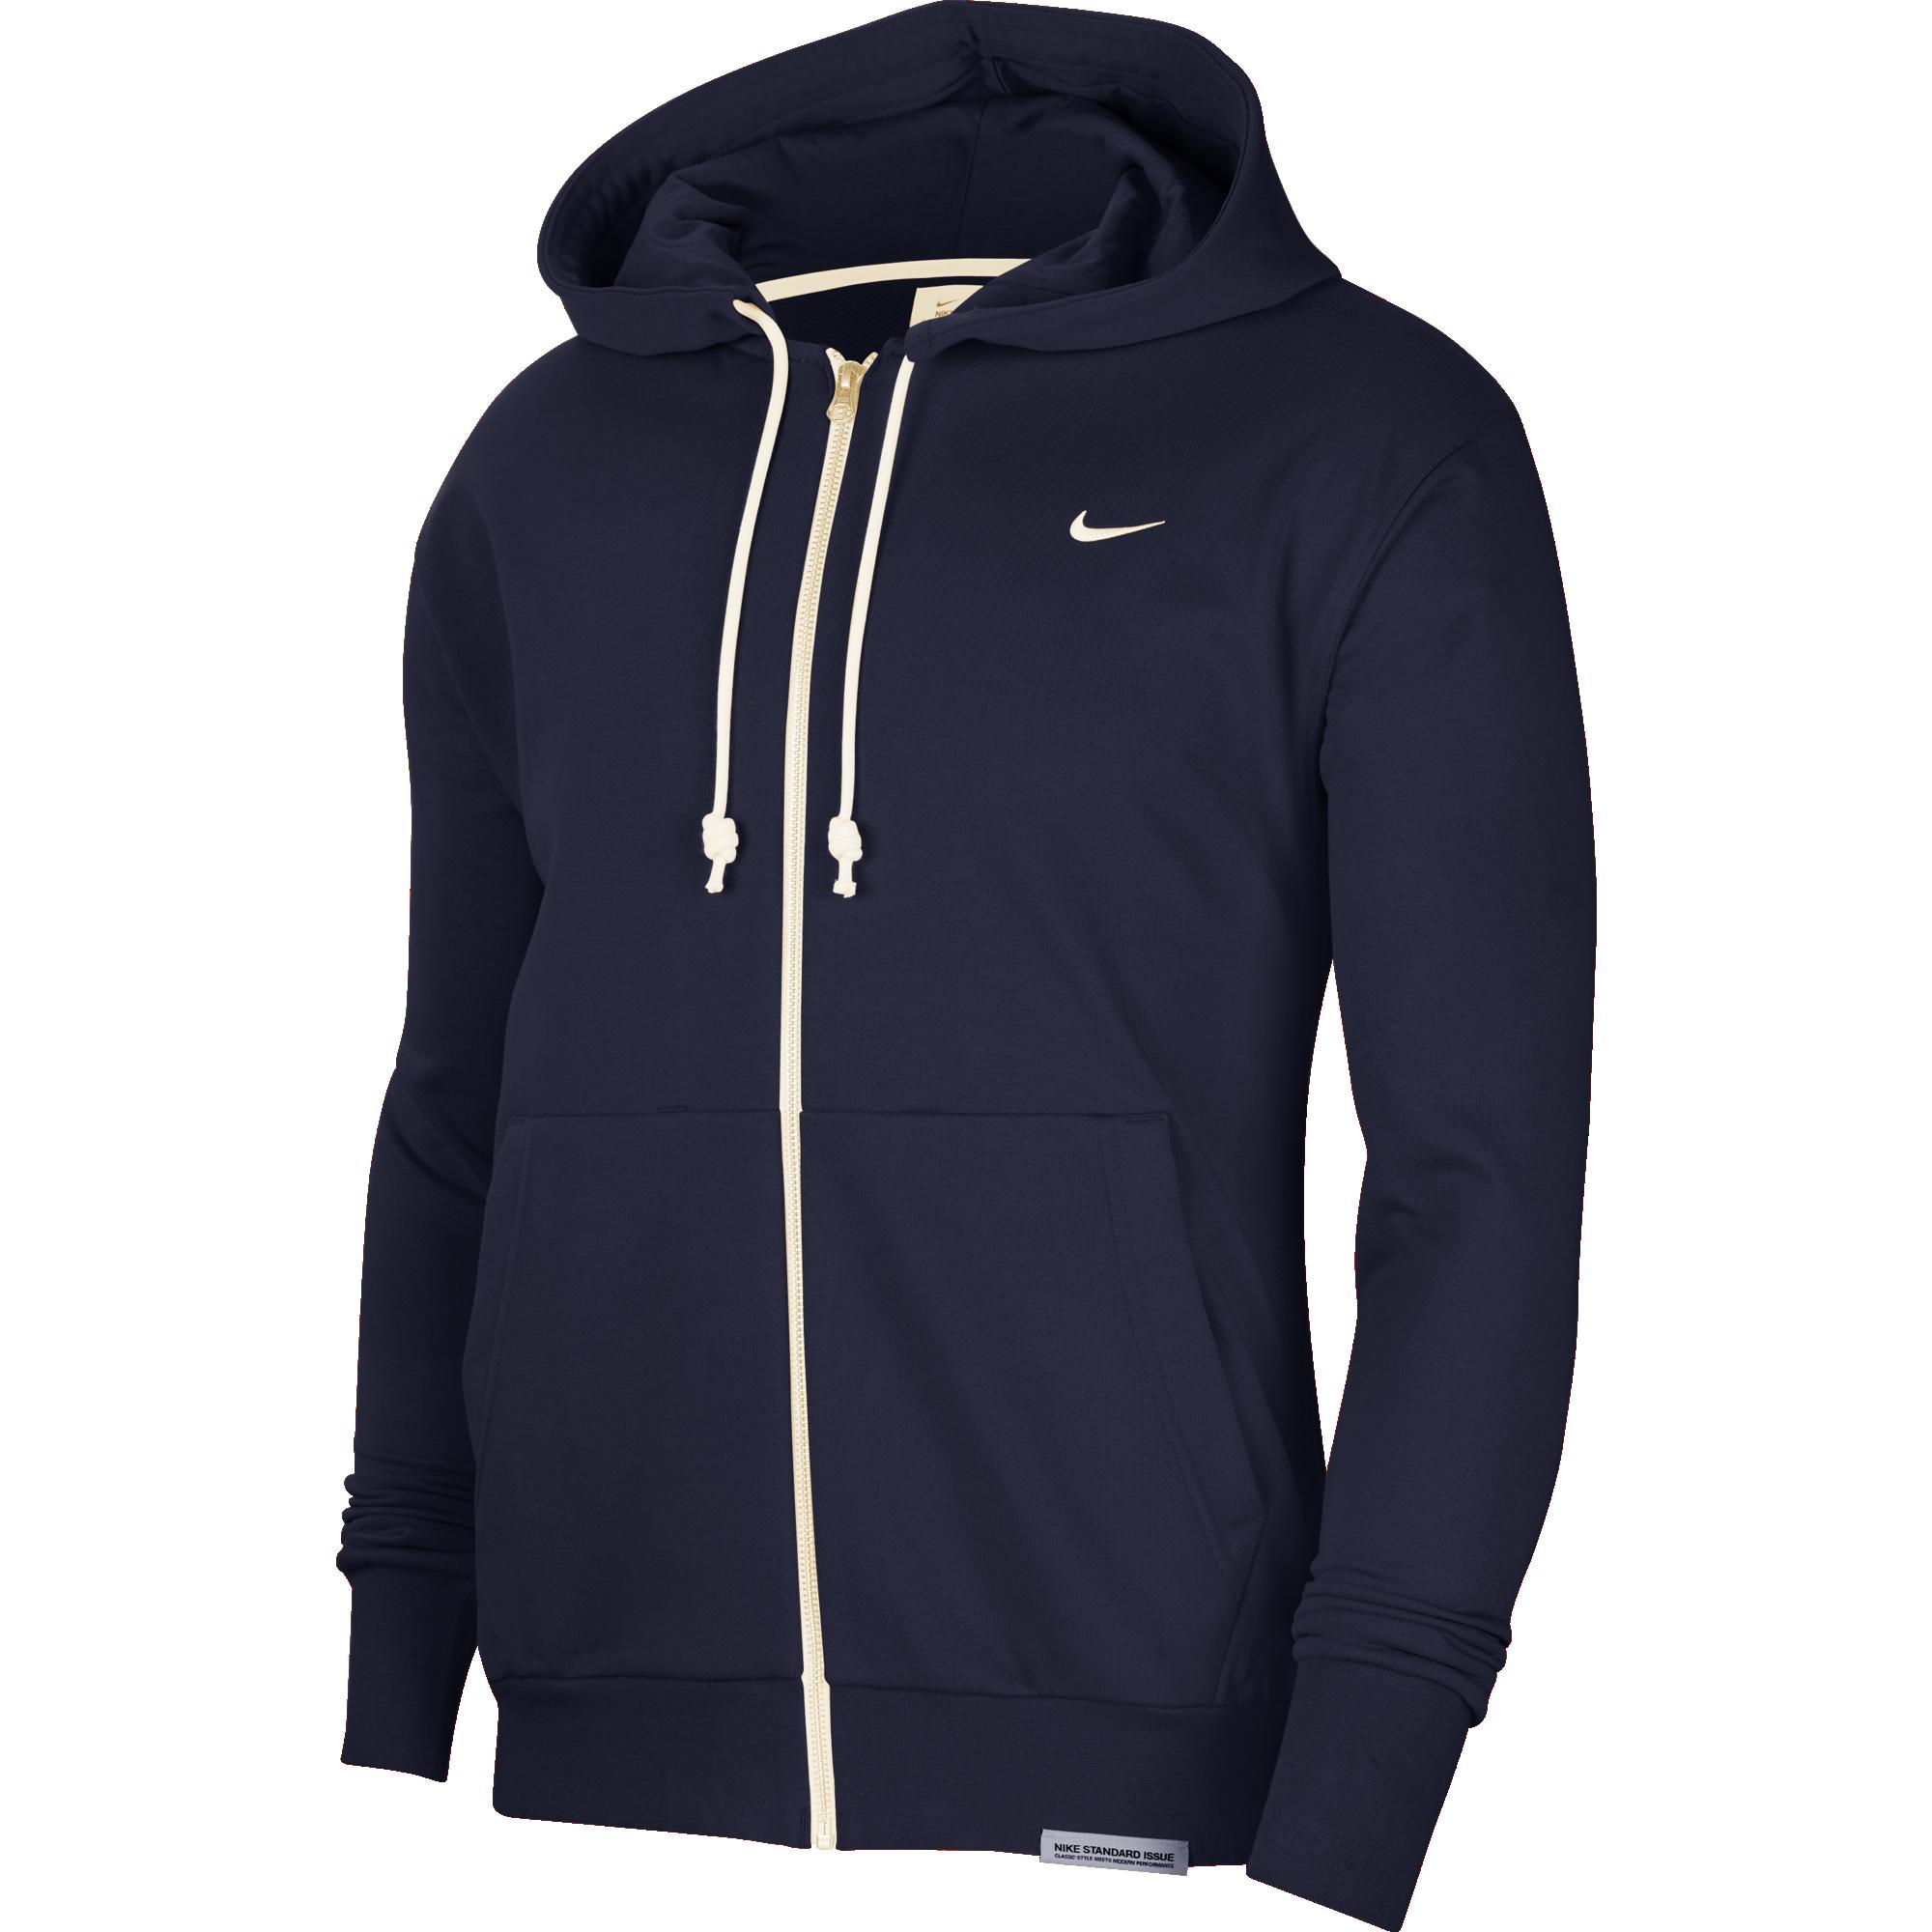 pozo imitar vertical  Nike Dri-Fit Standard Issue Hoodie CK6362 419 - Sam Tabak